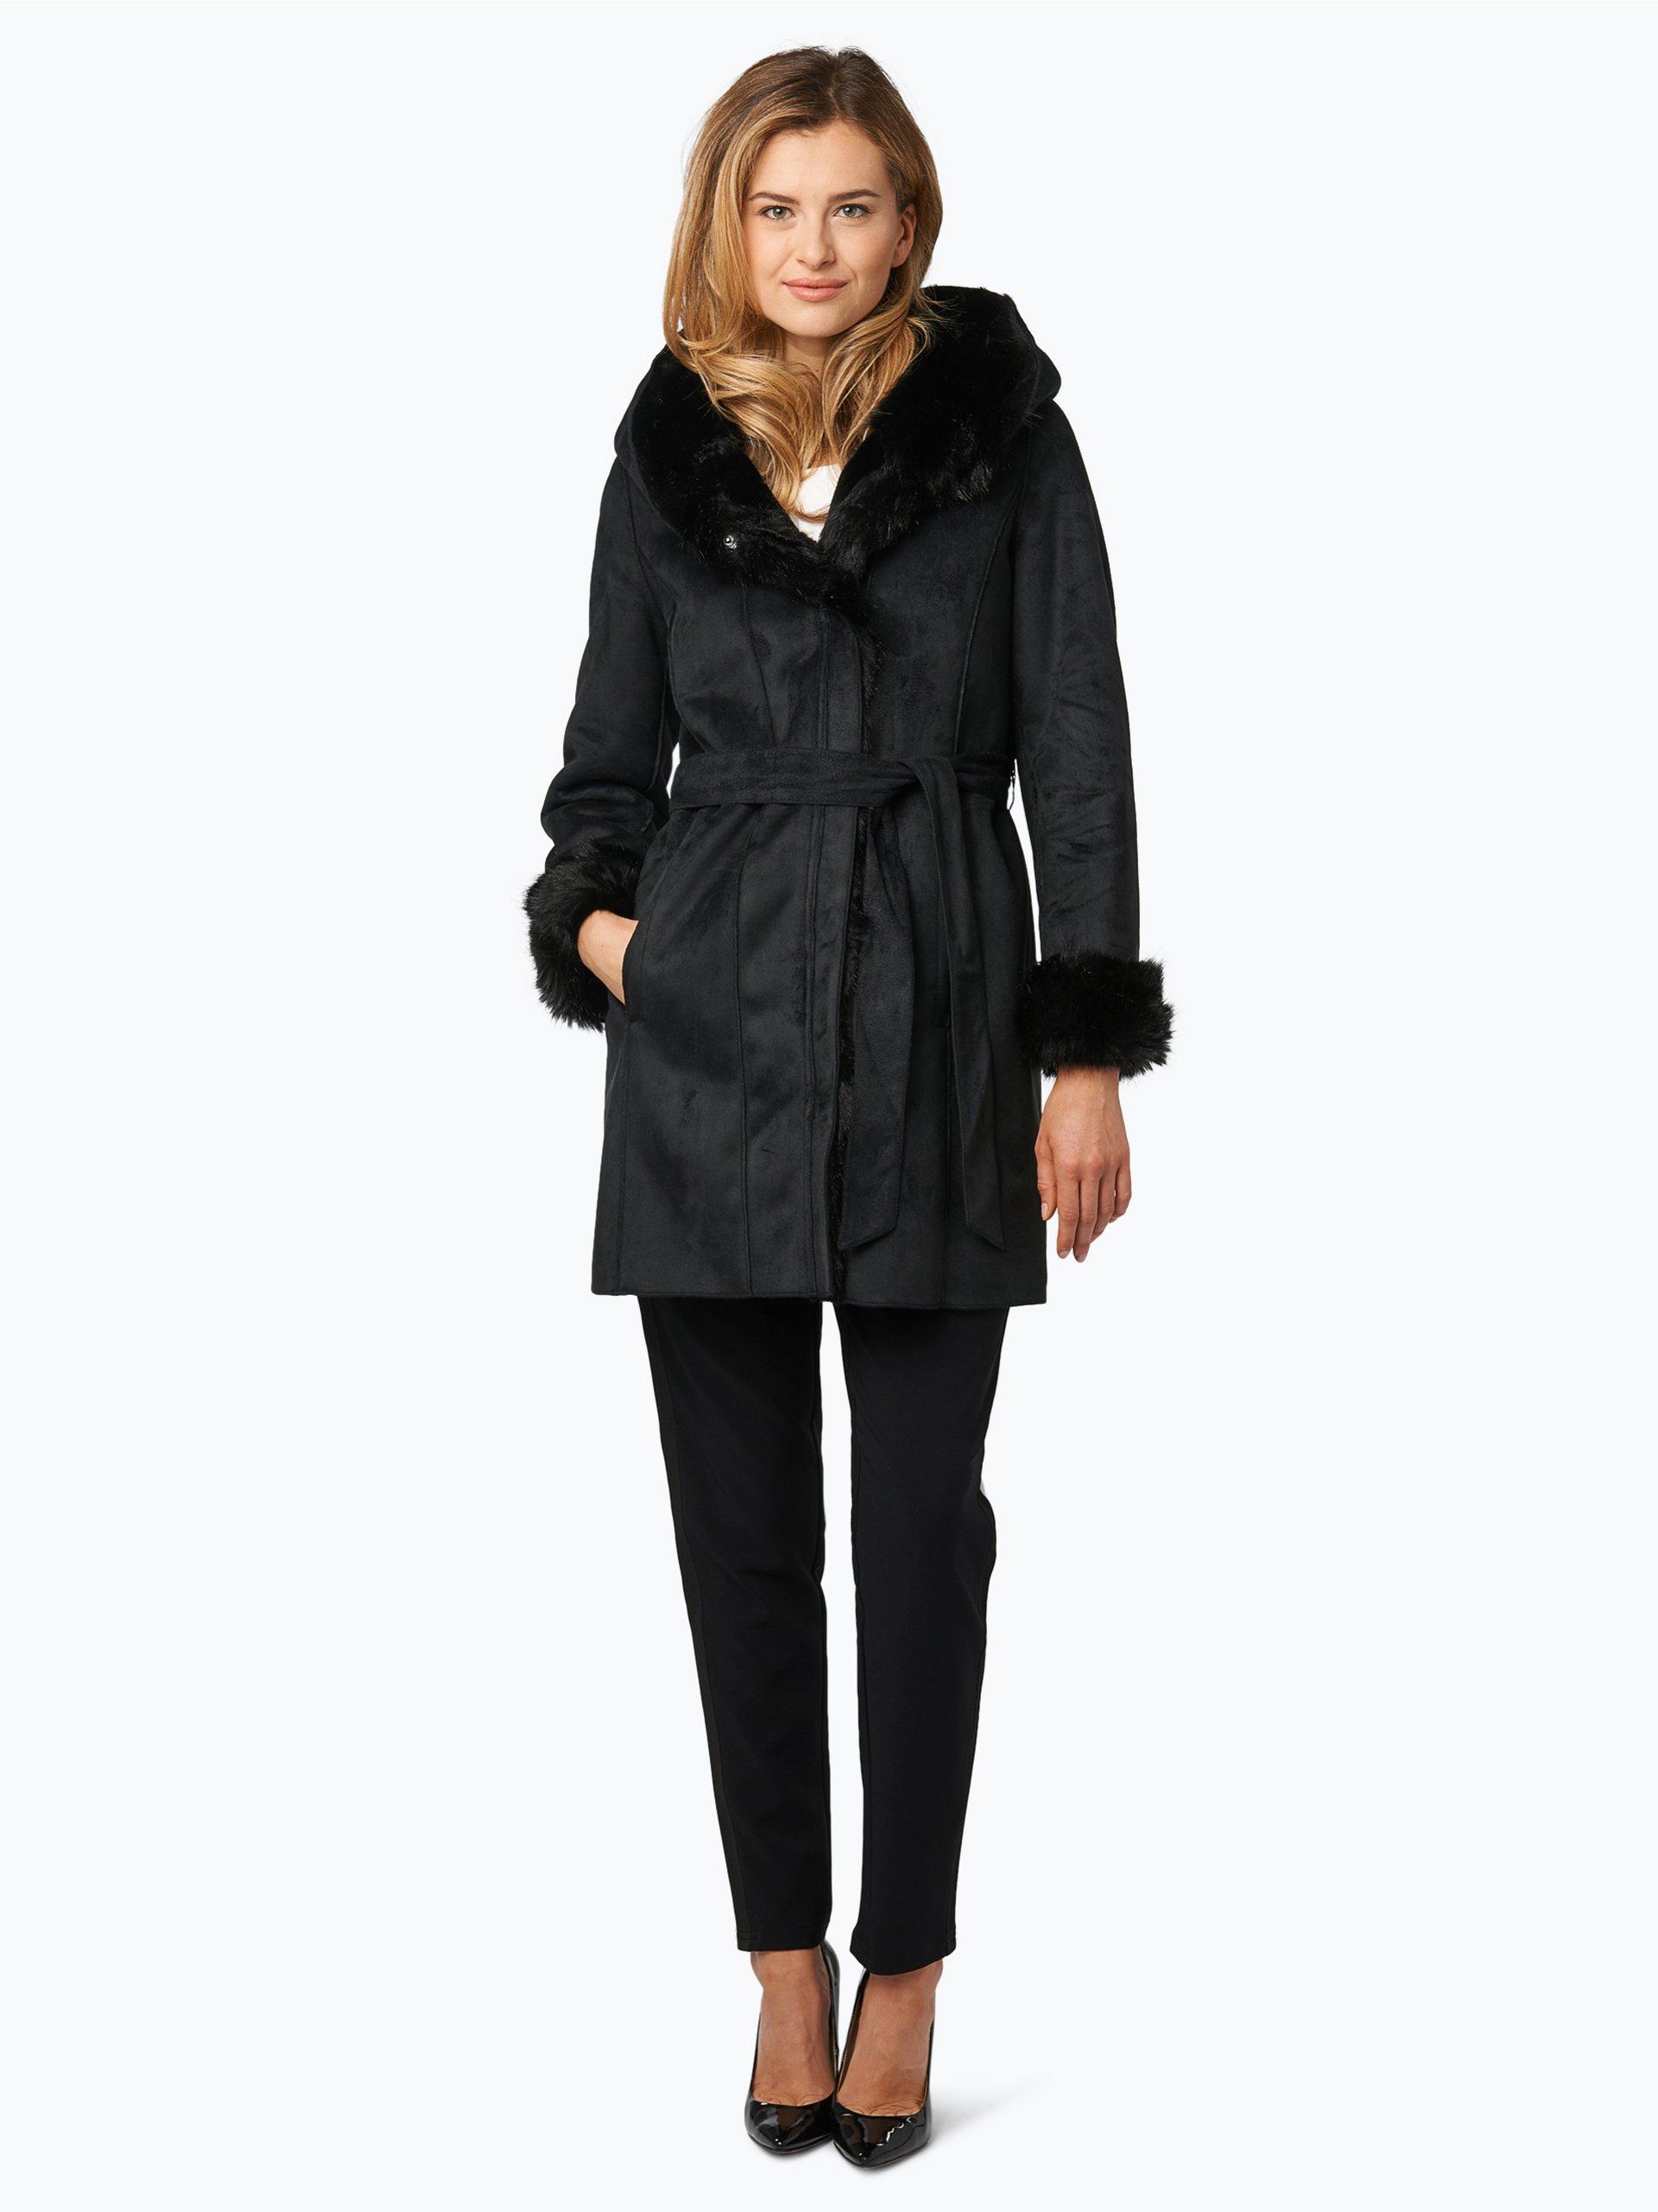 marc cain additions damen mantel schwarz uni online kaufen. Black Bedroom Furniture Sets. Home Design Ideas